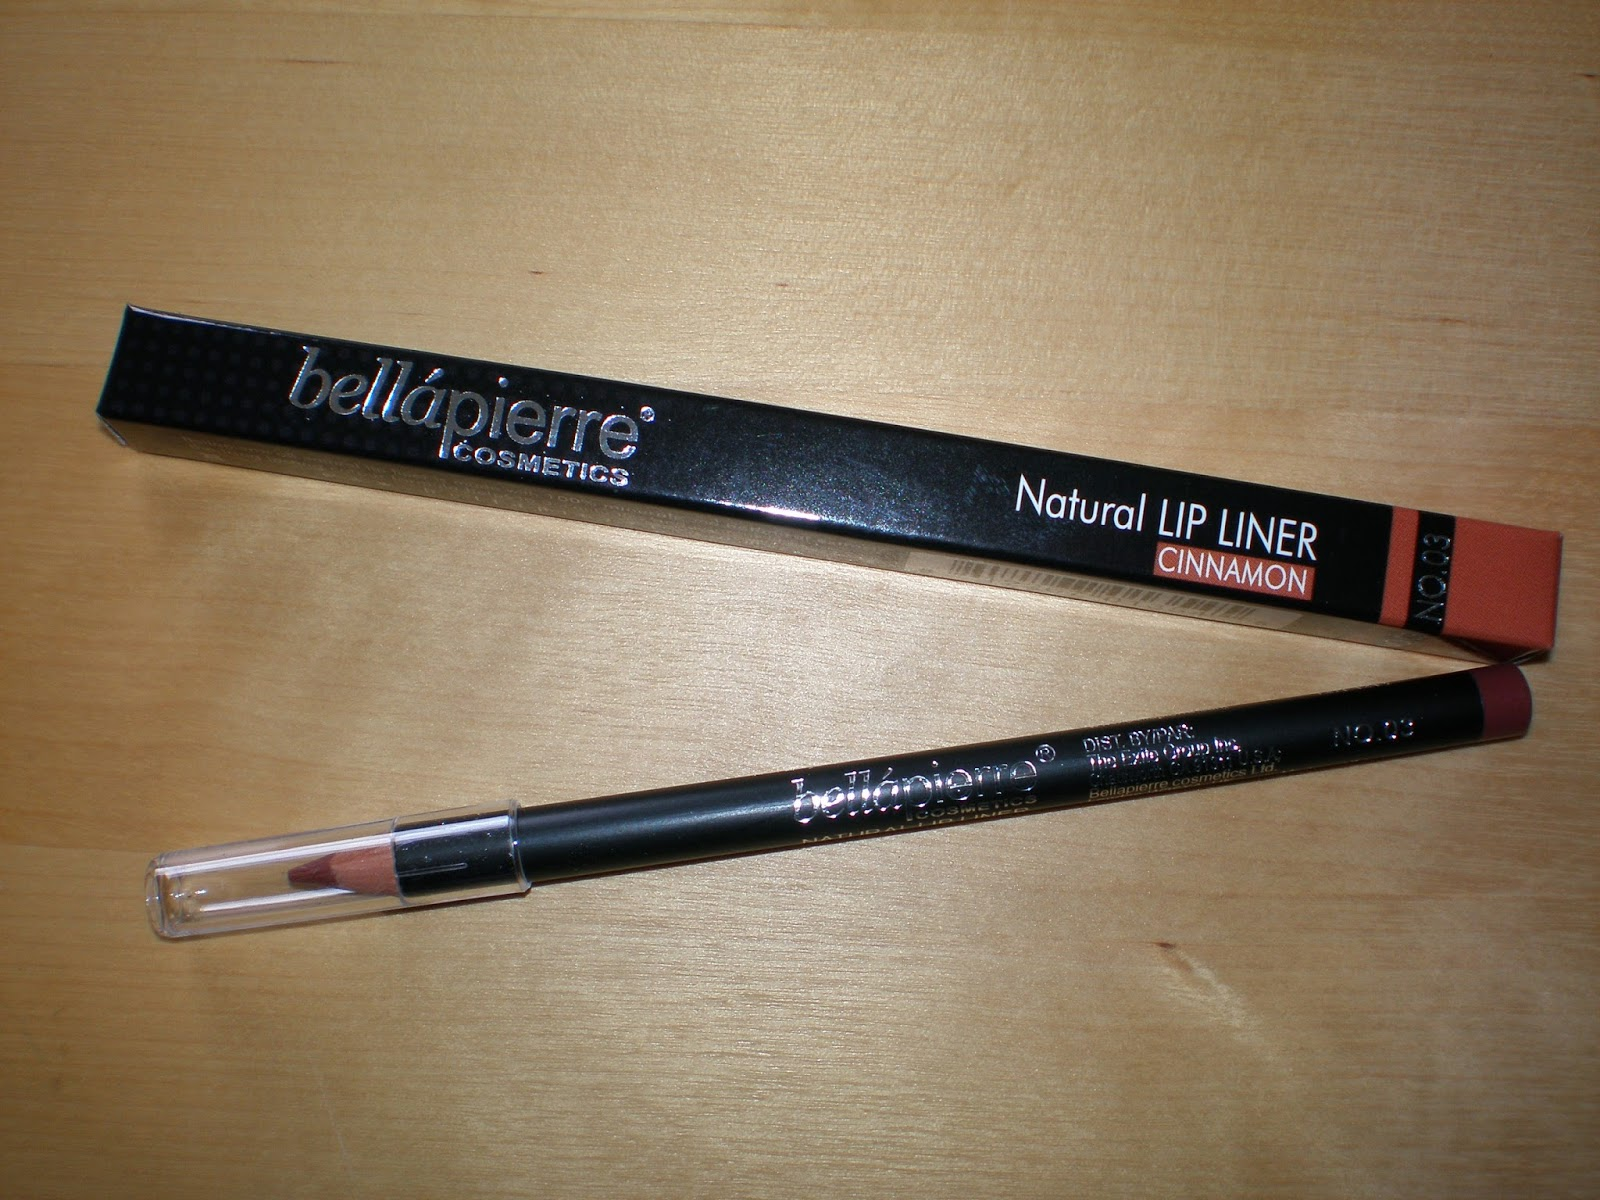 Bellapierre cosmetics Natural Lip Liner in Cinnamon